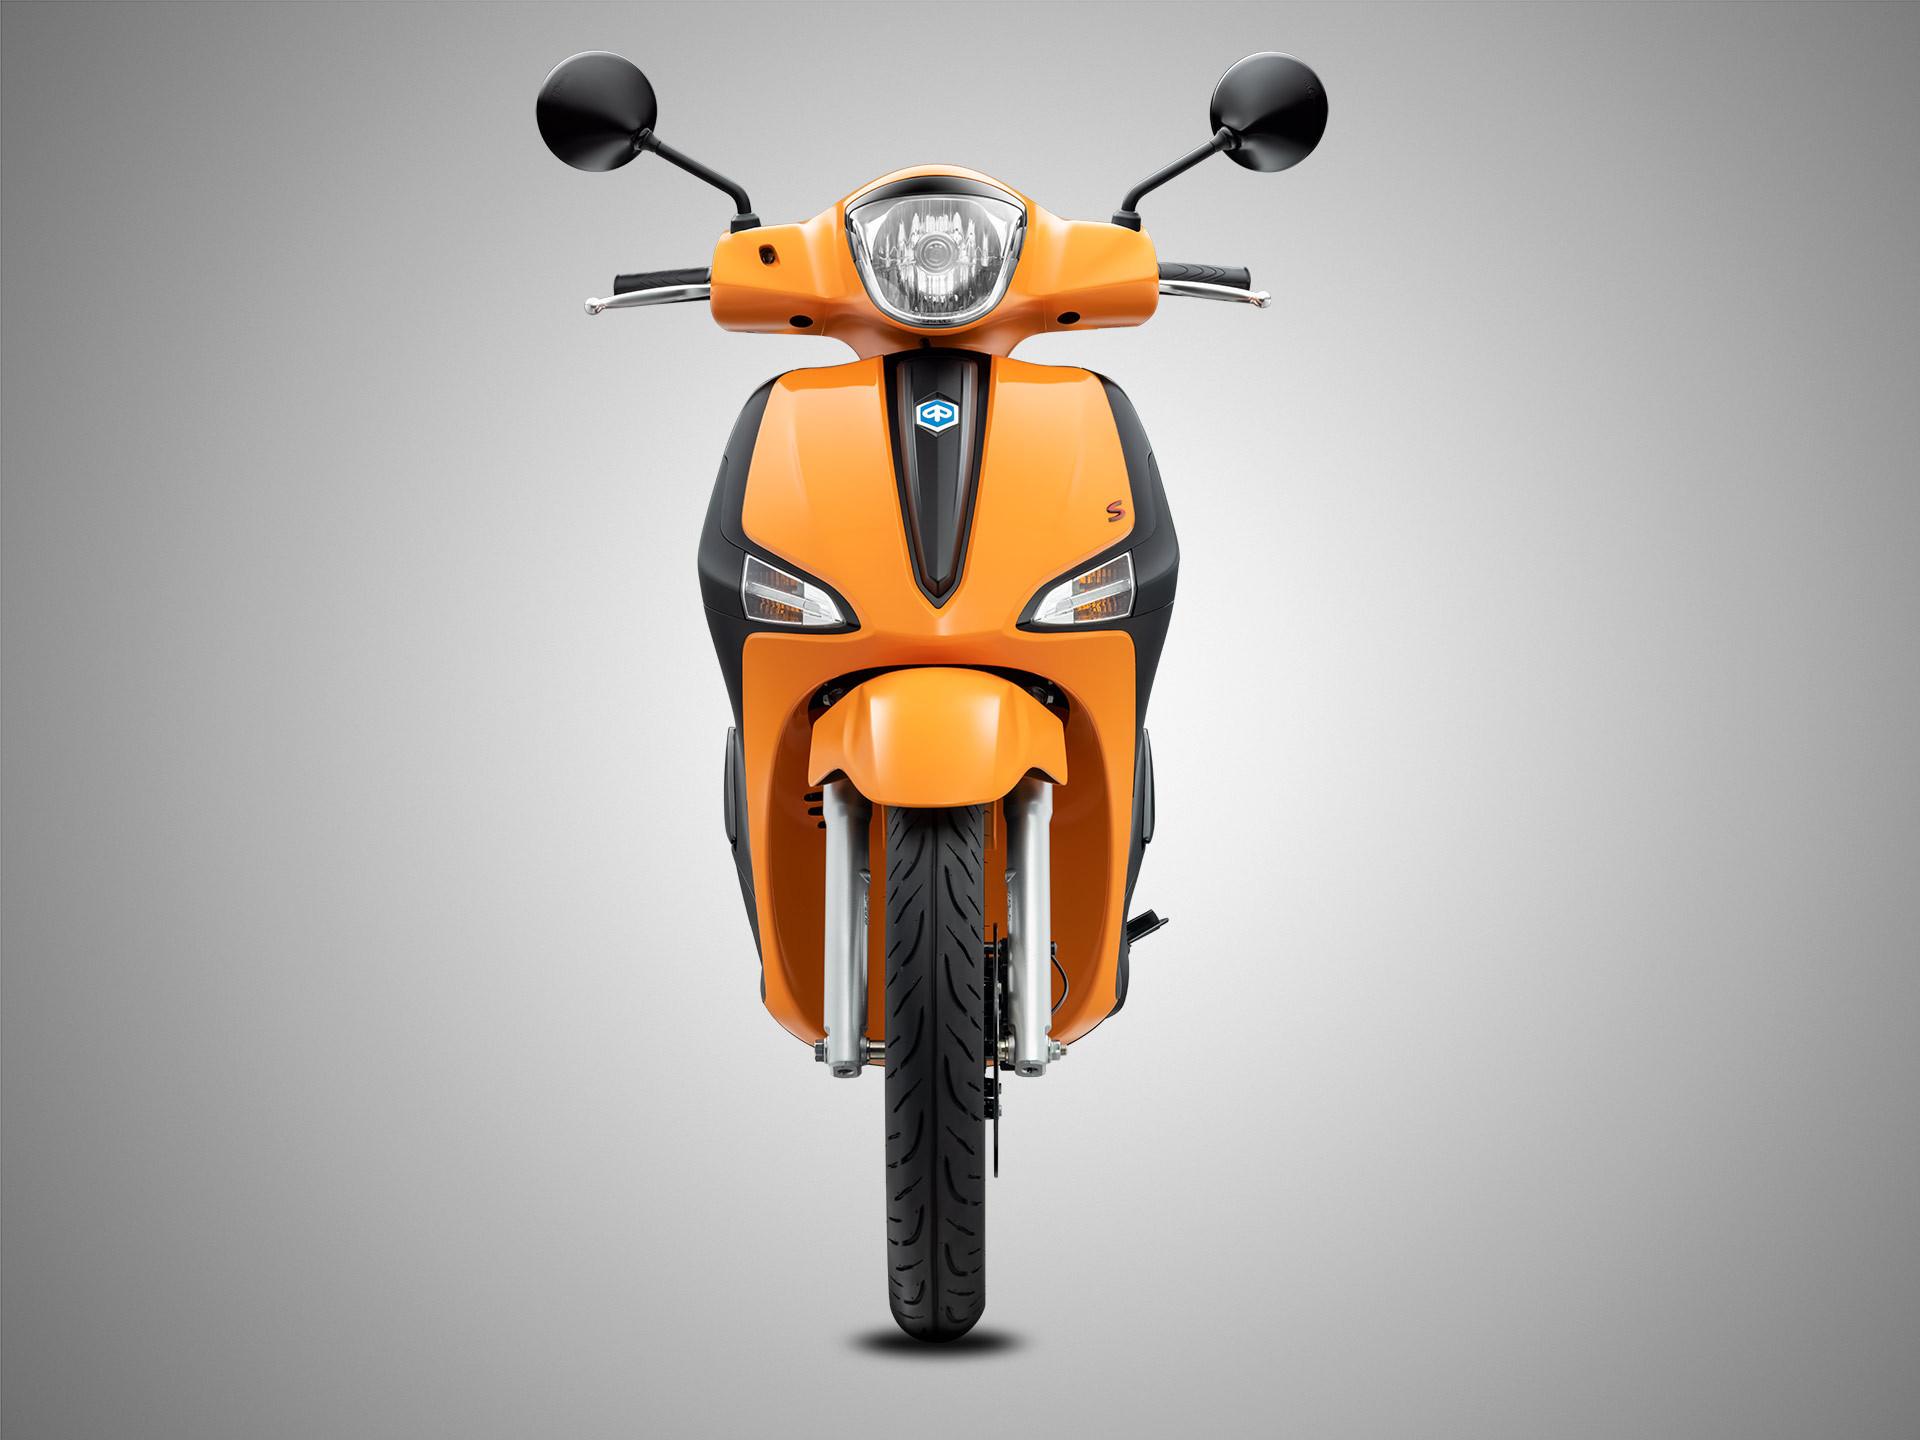 Xe Piaggio Liberty S 125 màu cam